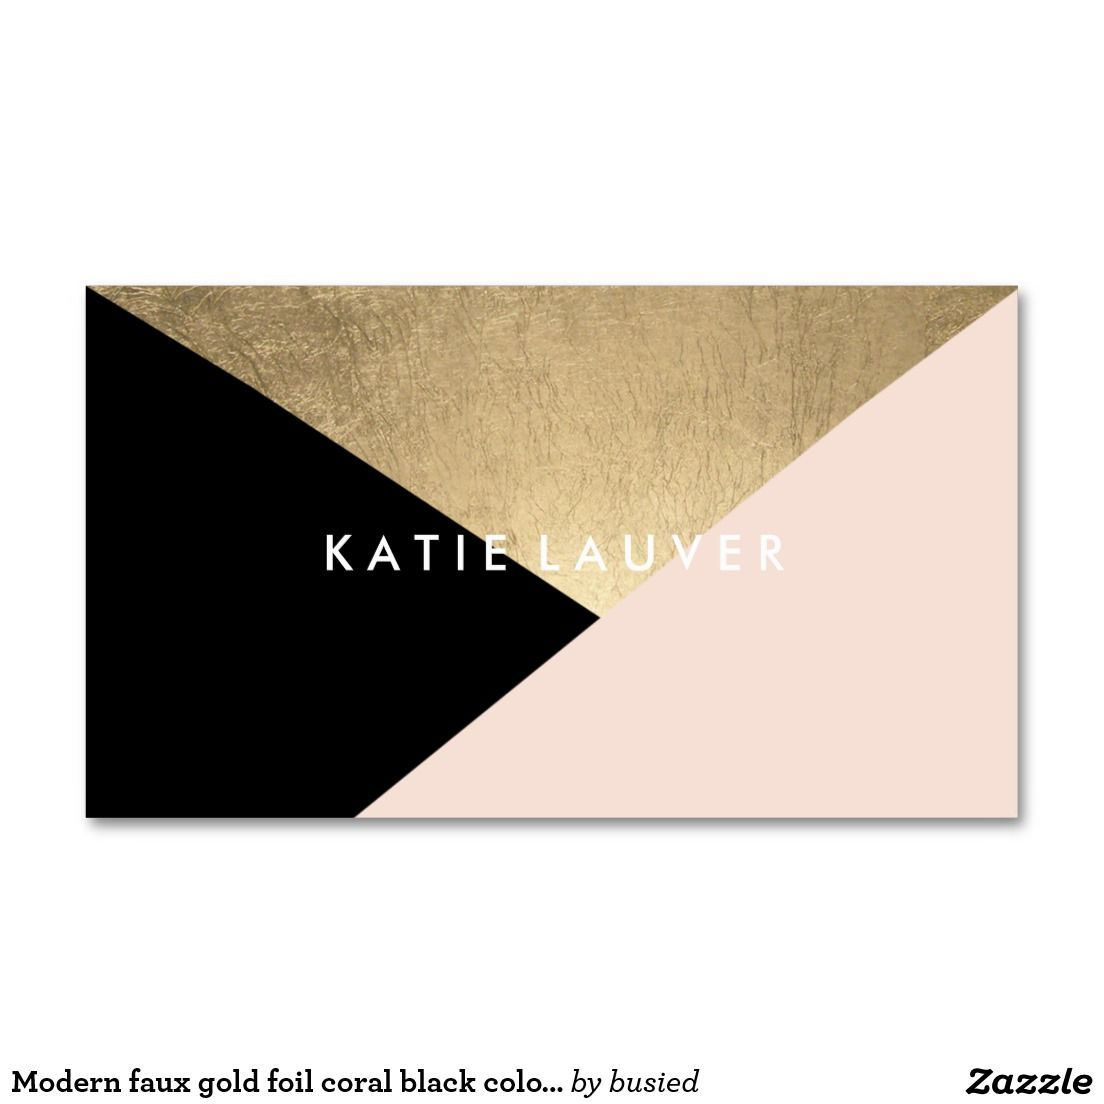 Modern faux gold foil coral black color block chic standard business ...